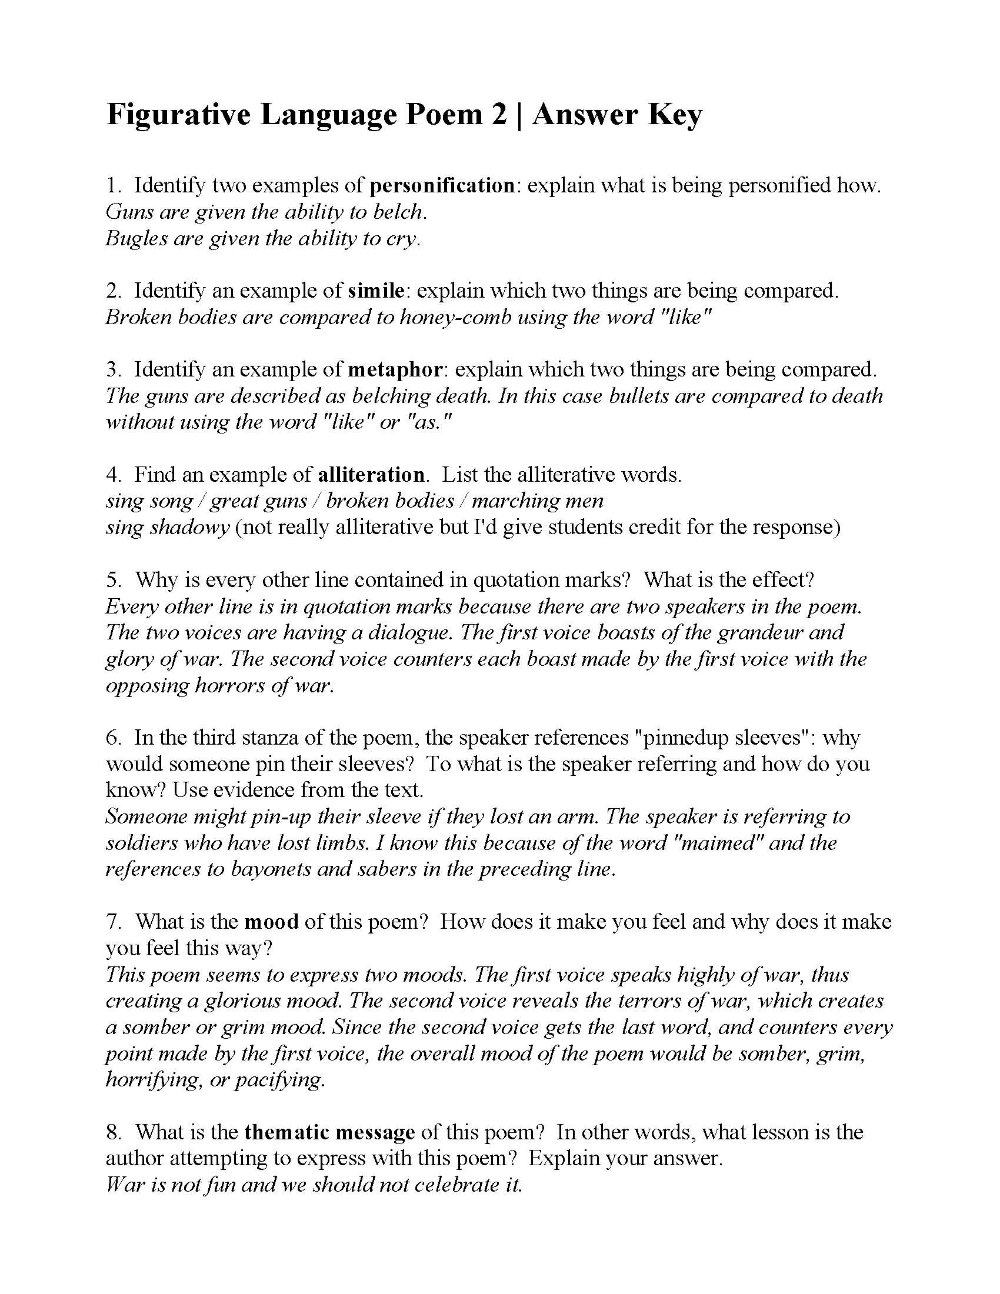 medium resolution of Figurative Language Poem 2: I Sing the Battle by Harry Kemp   Answers   Figurative  language poems